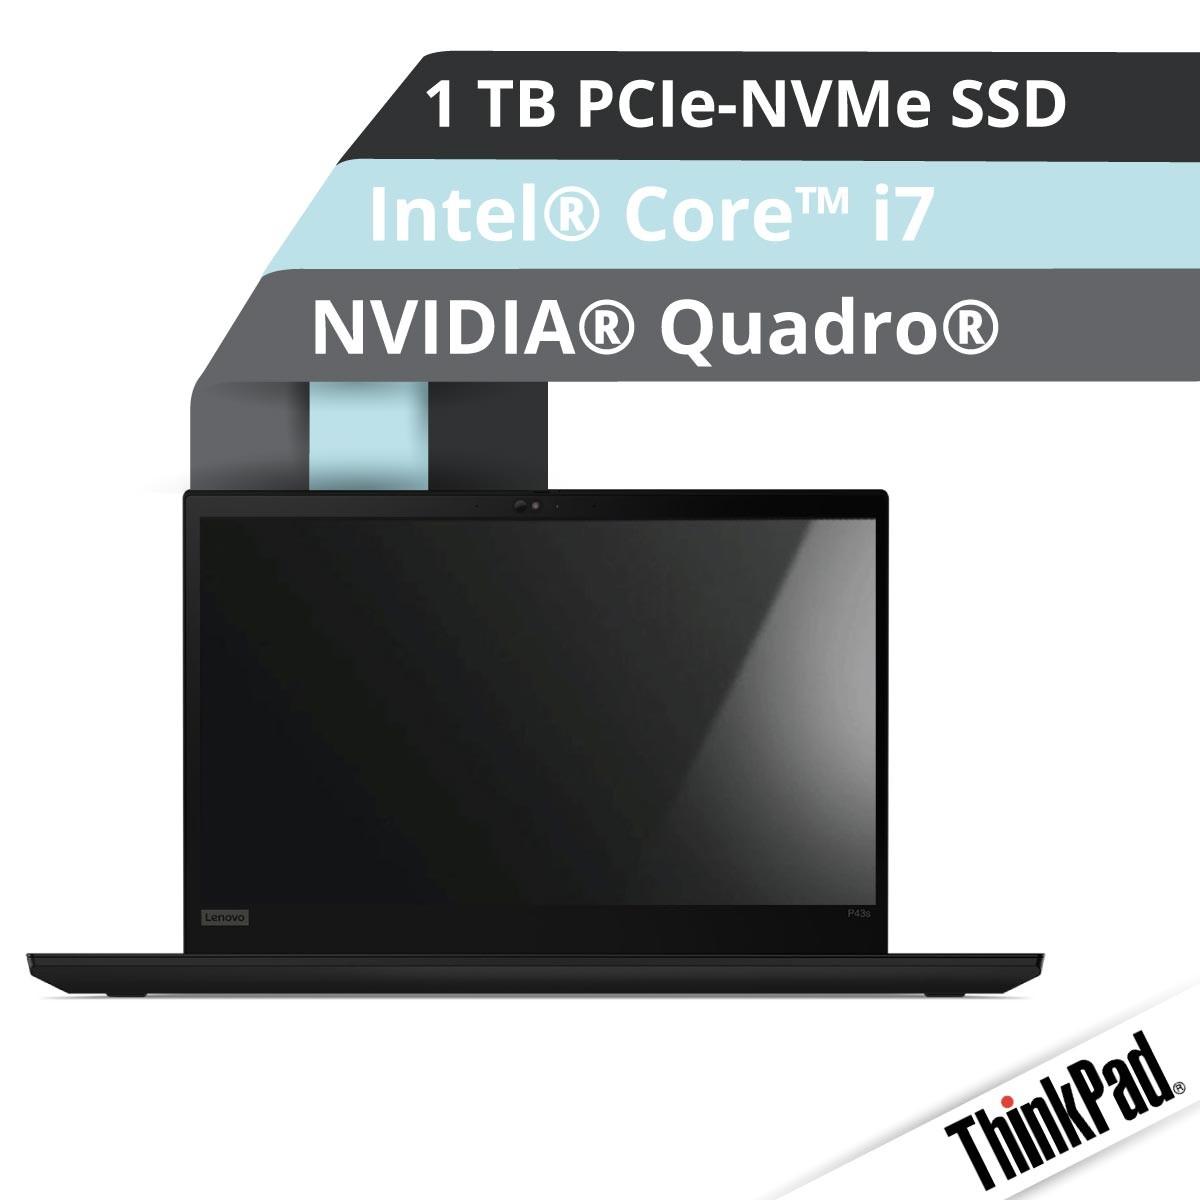 (EOL) Lenovo™ ThinkPad® P43s Workstation Modell 20RH-0015